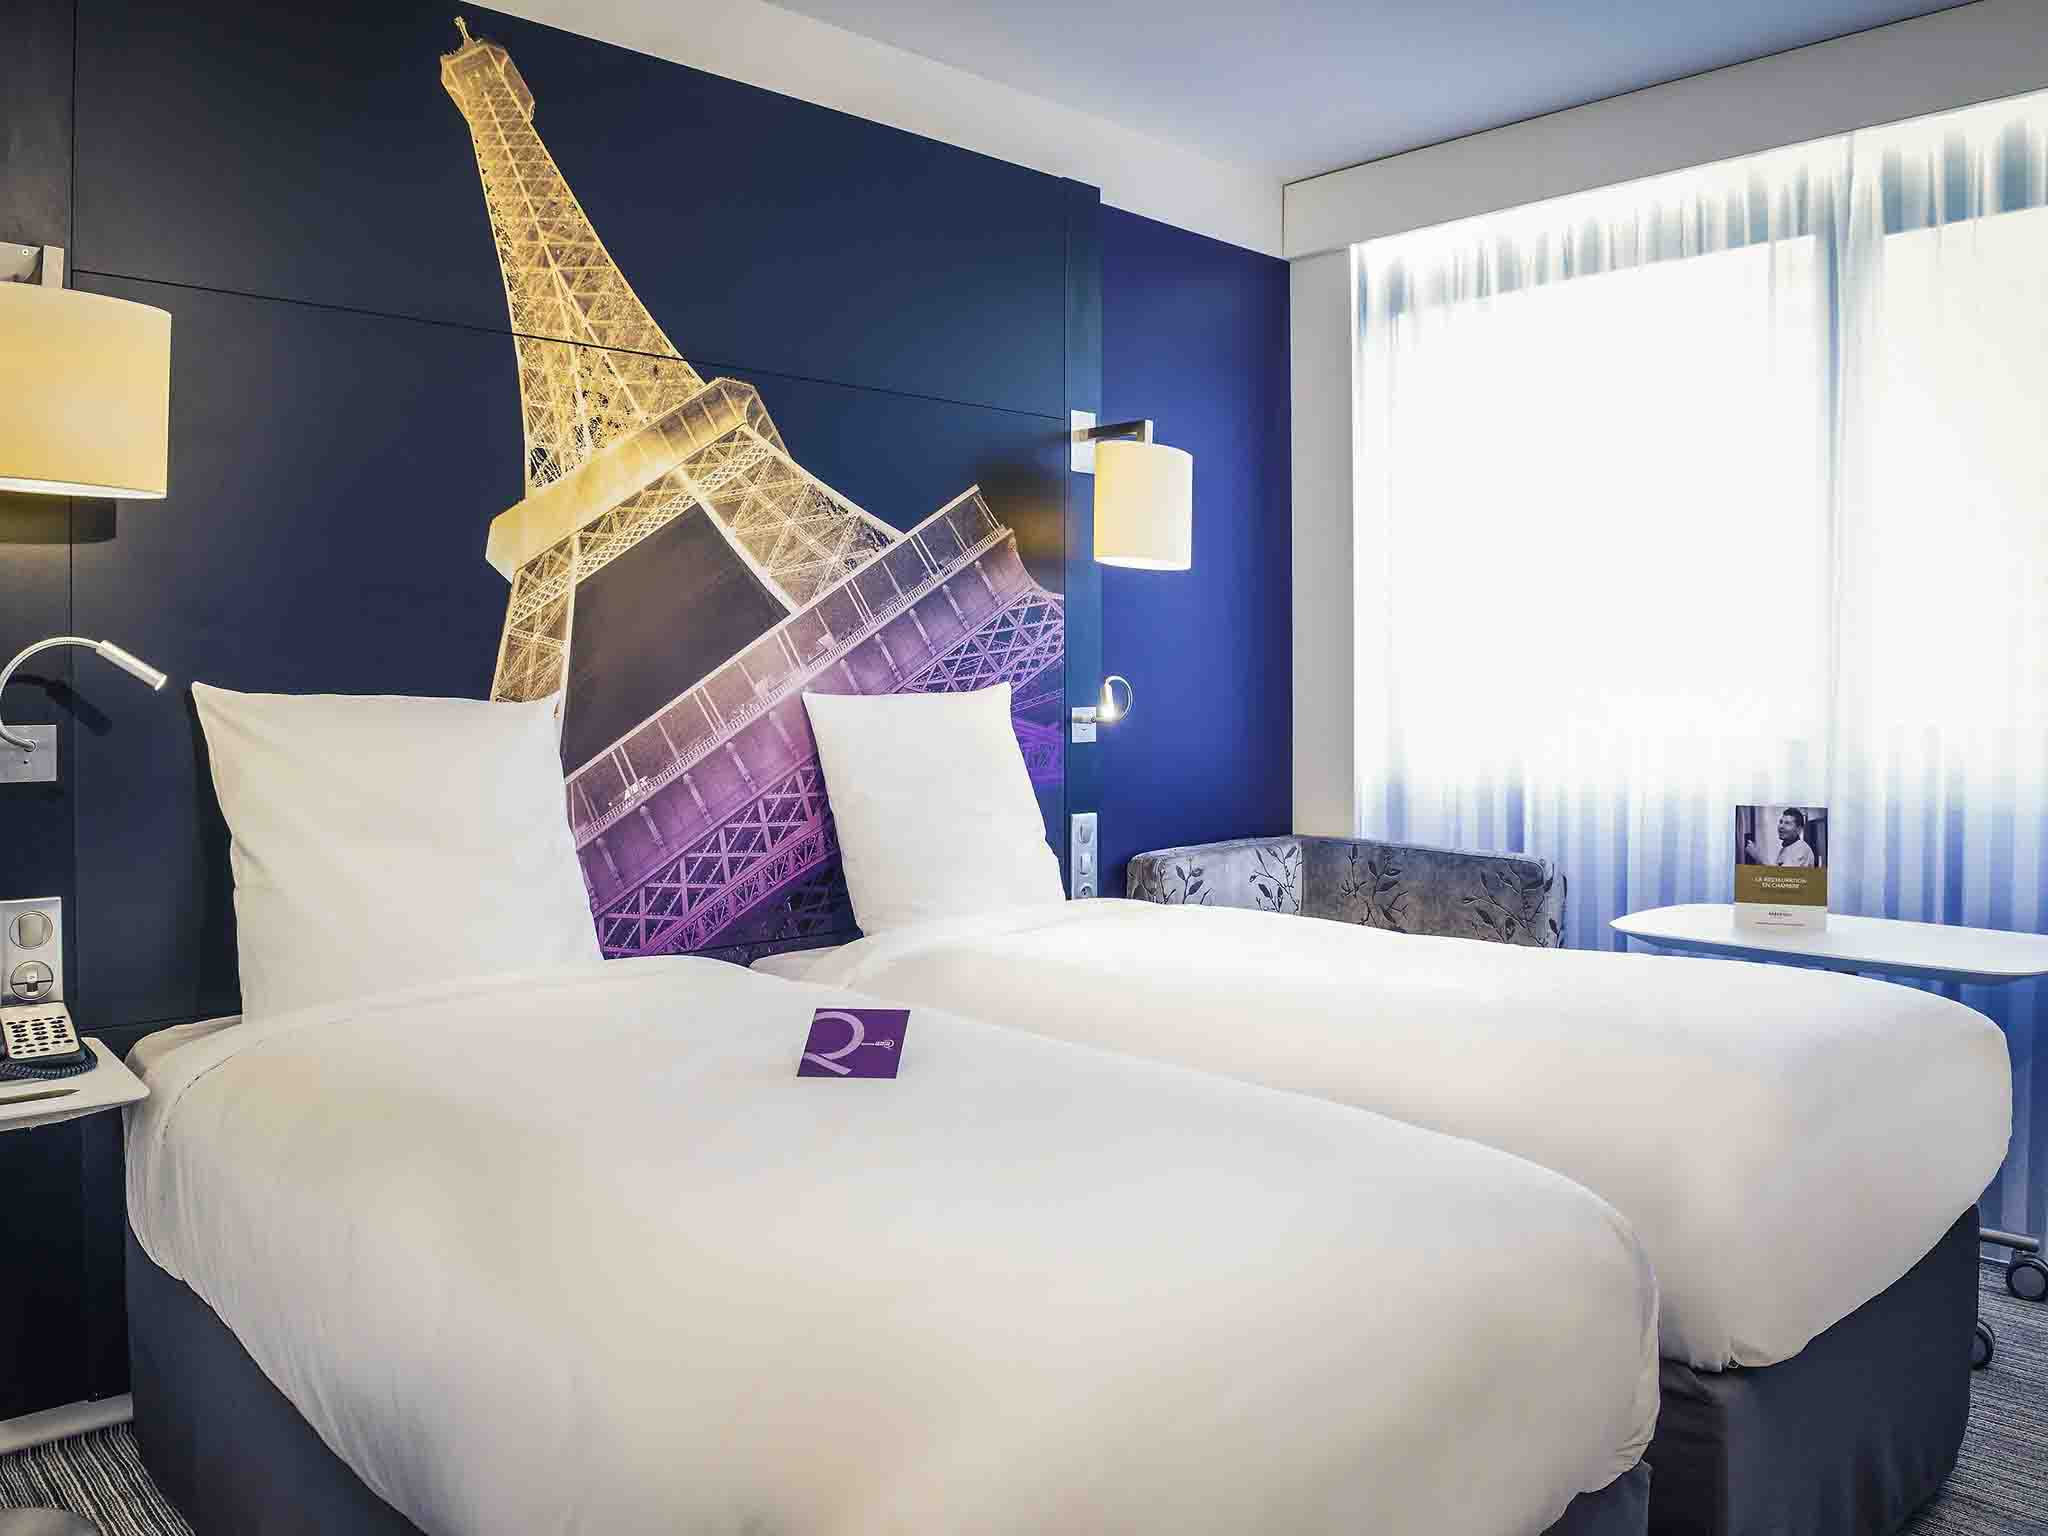 mercure-tour eiffel-hotel2